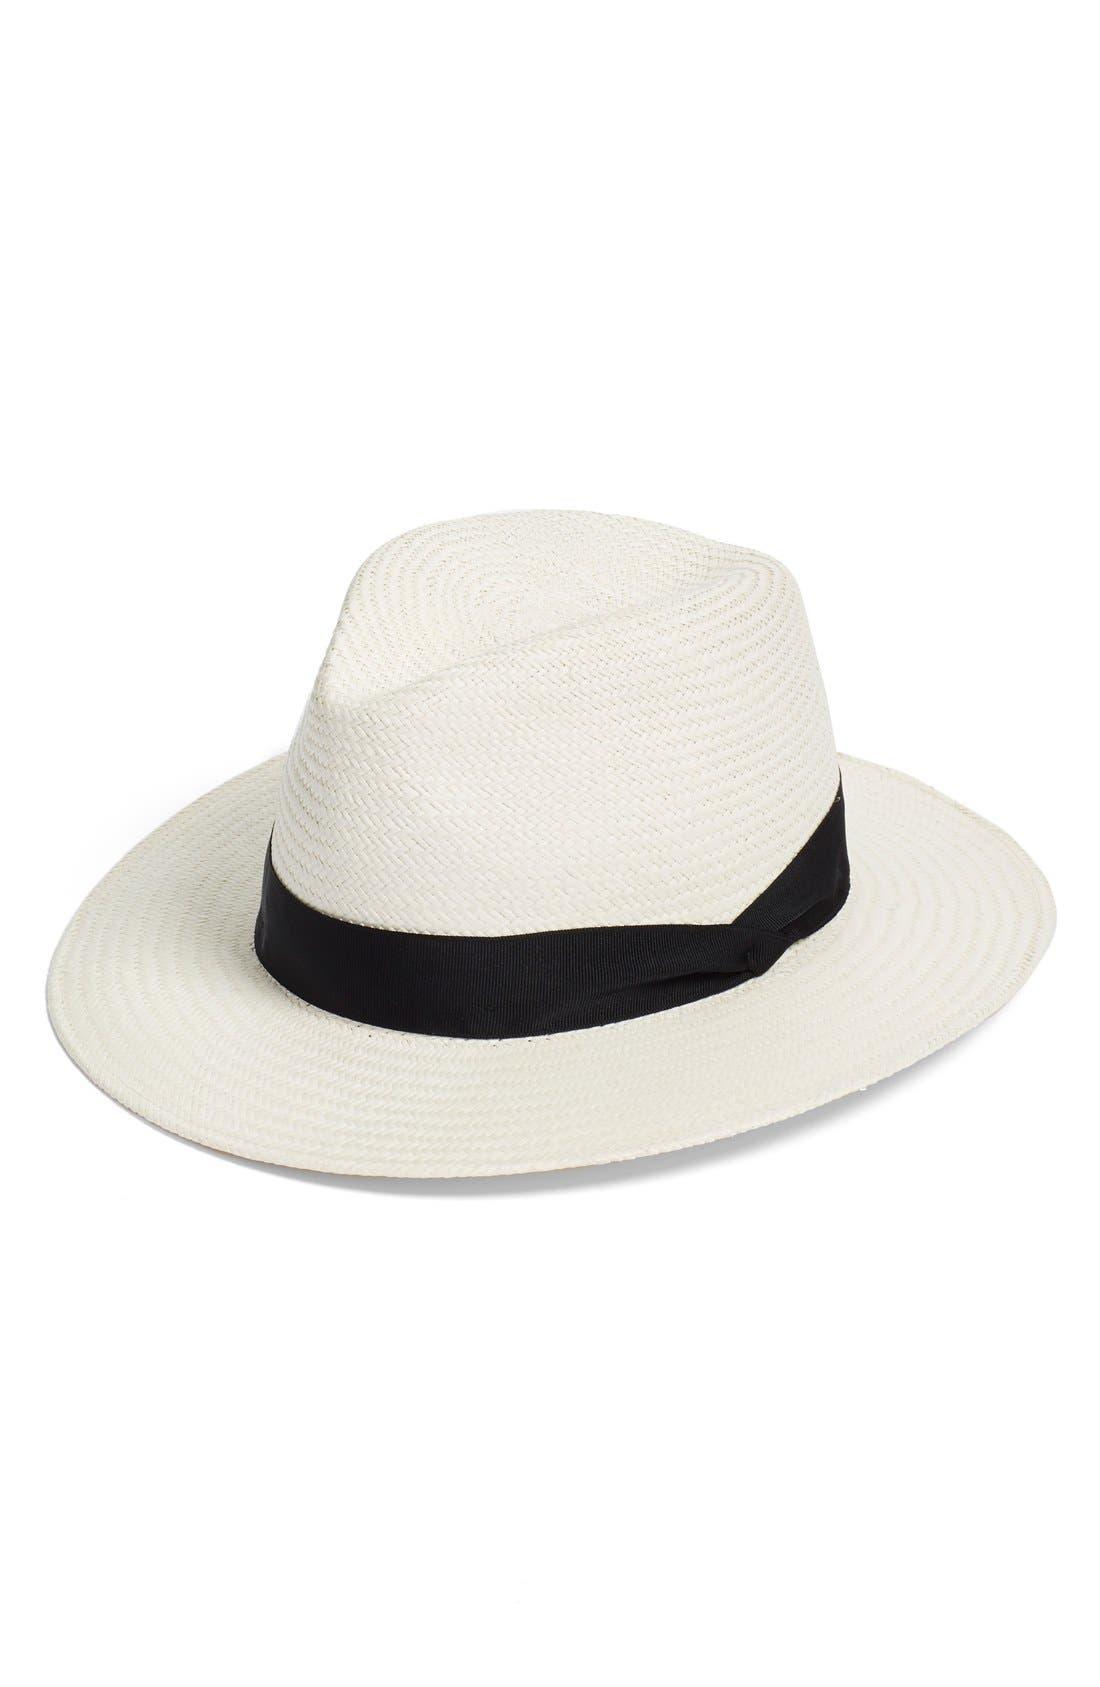 RAG & BONE Straw Panama Hat, Main, color, WHITE